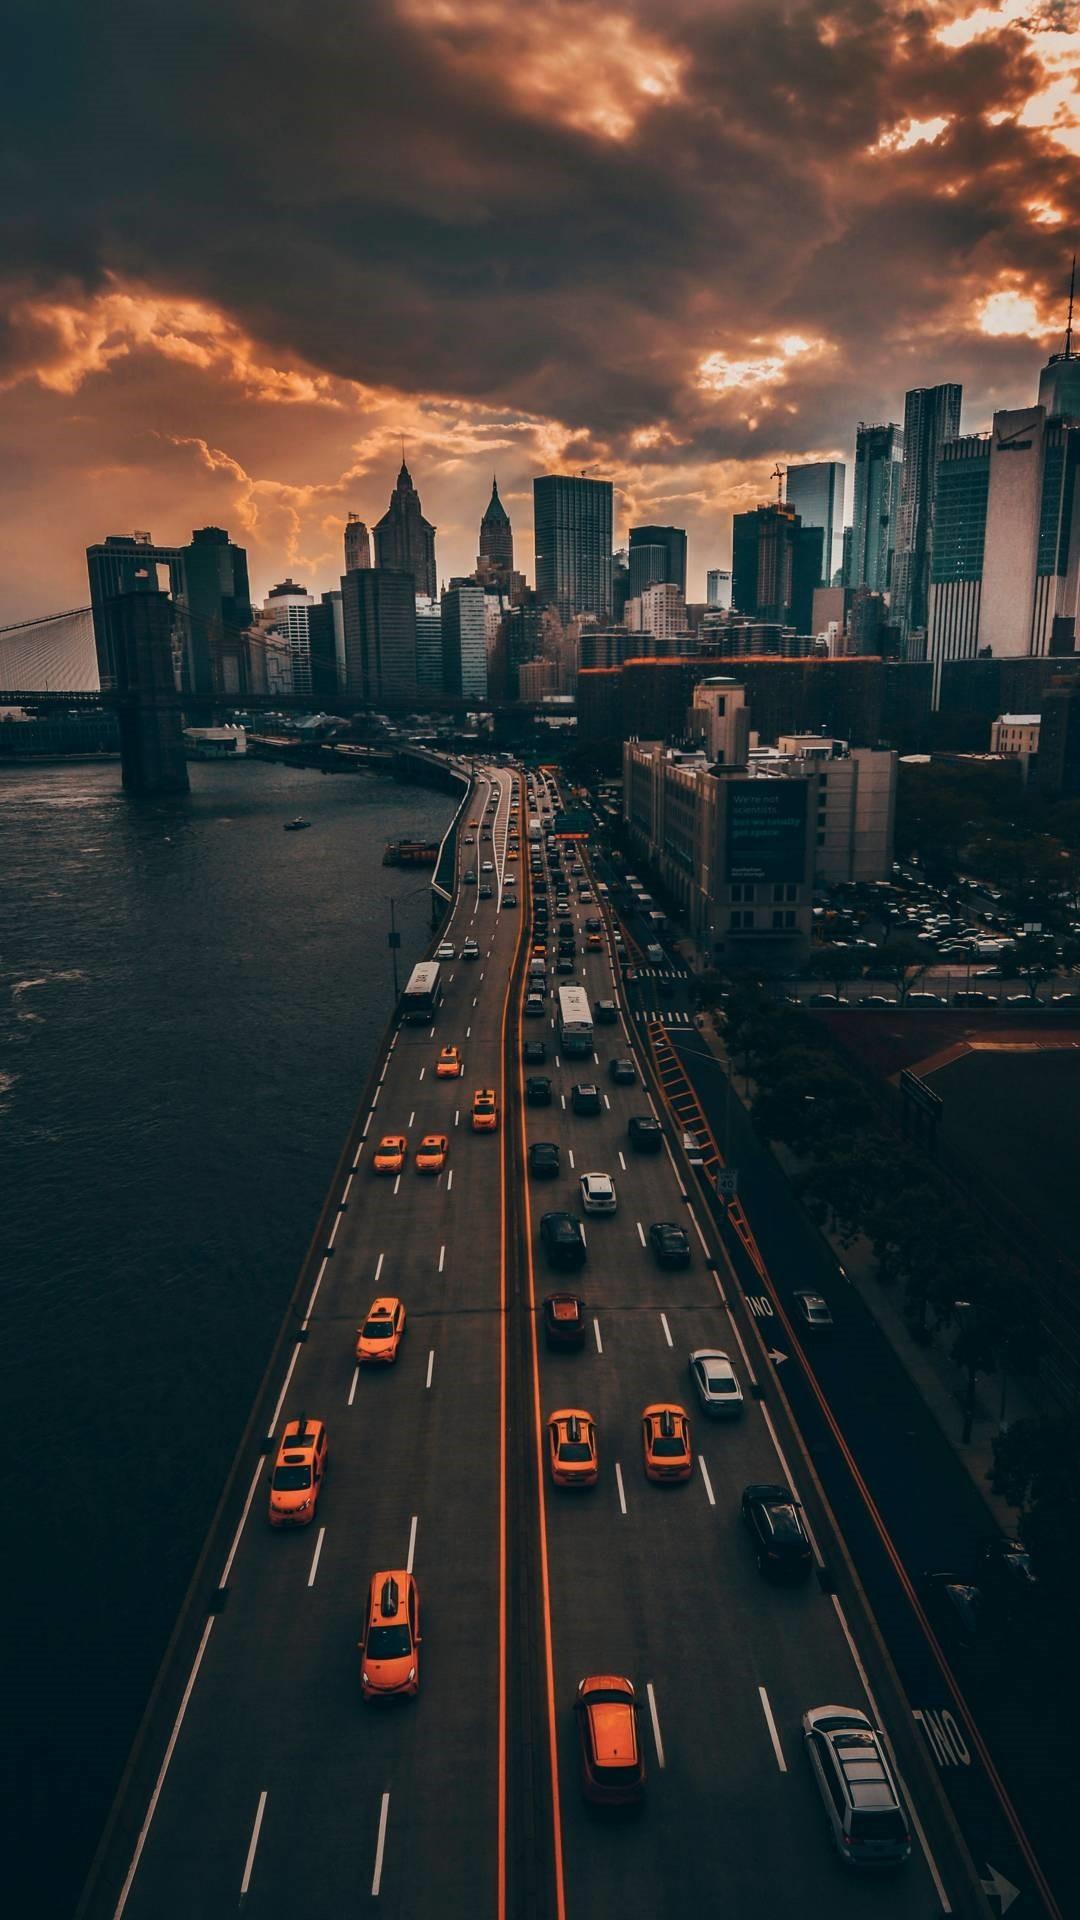 City wallpaper iphone